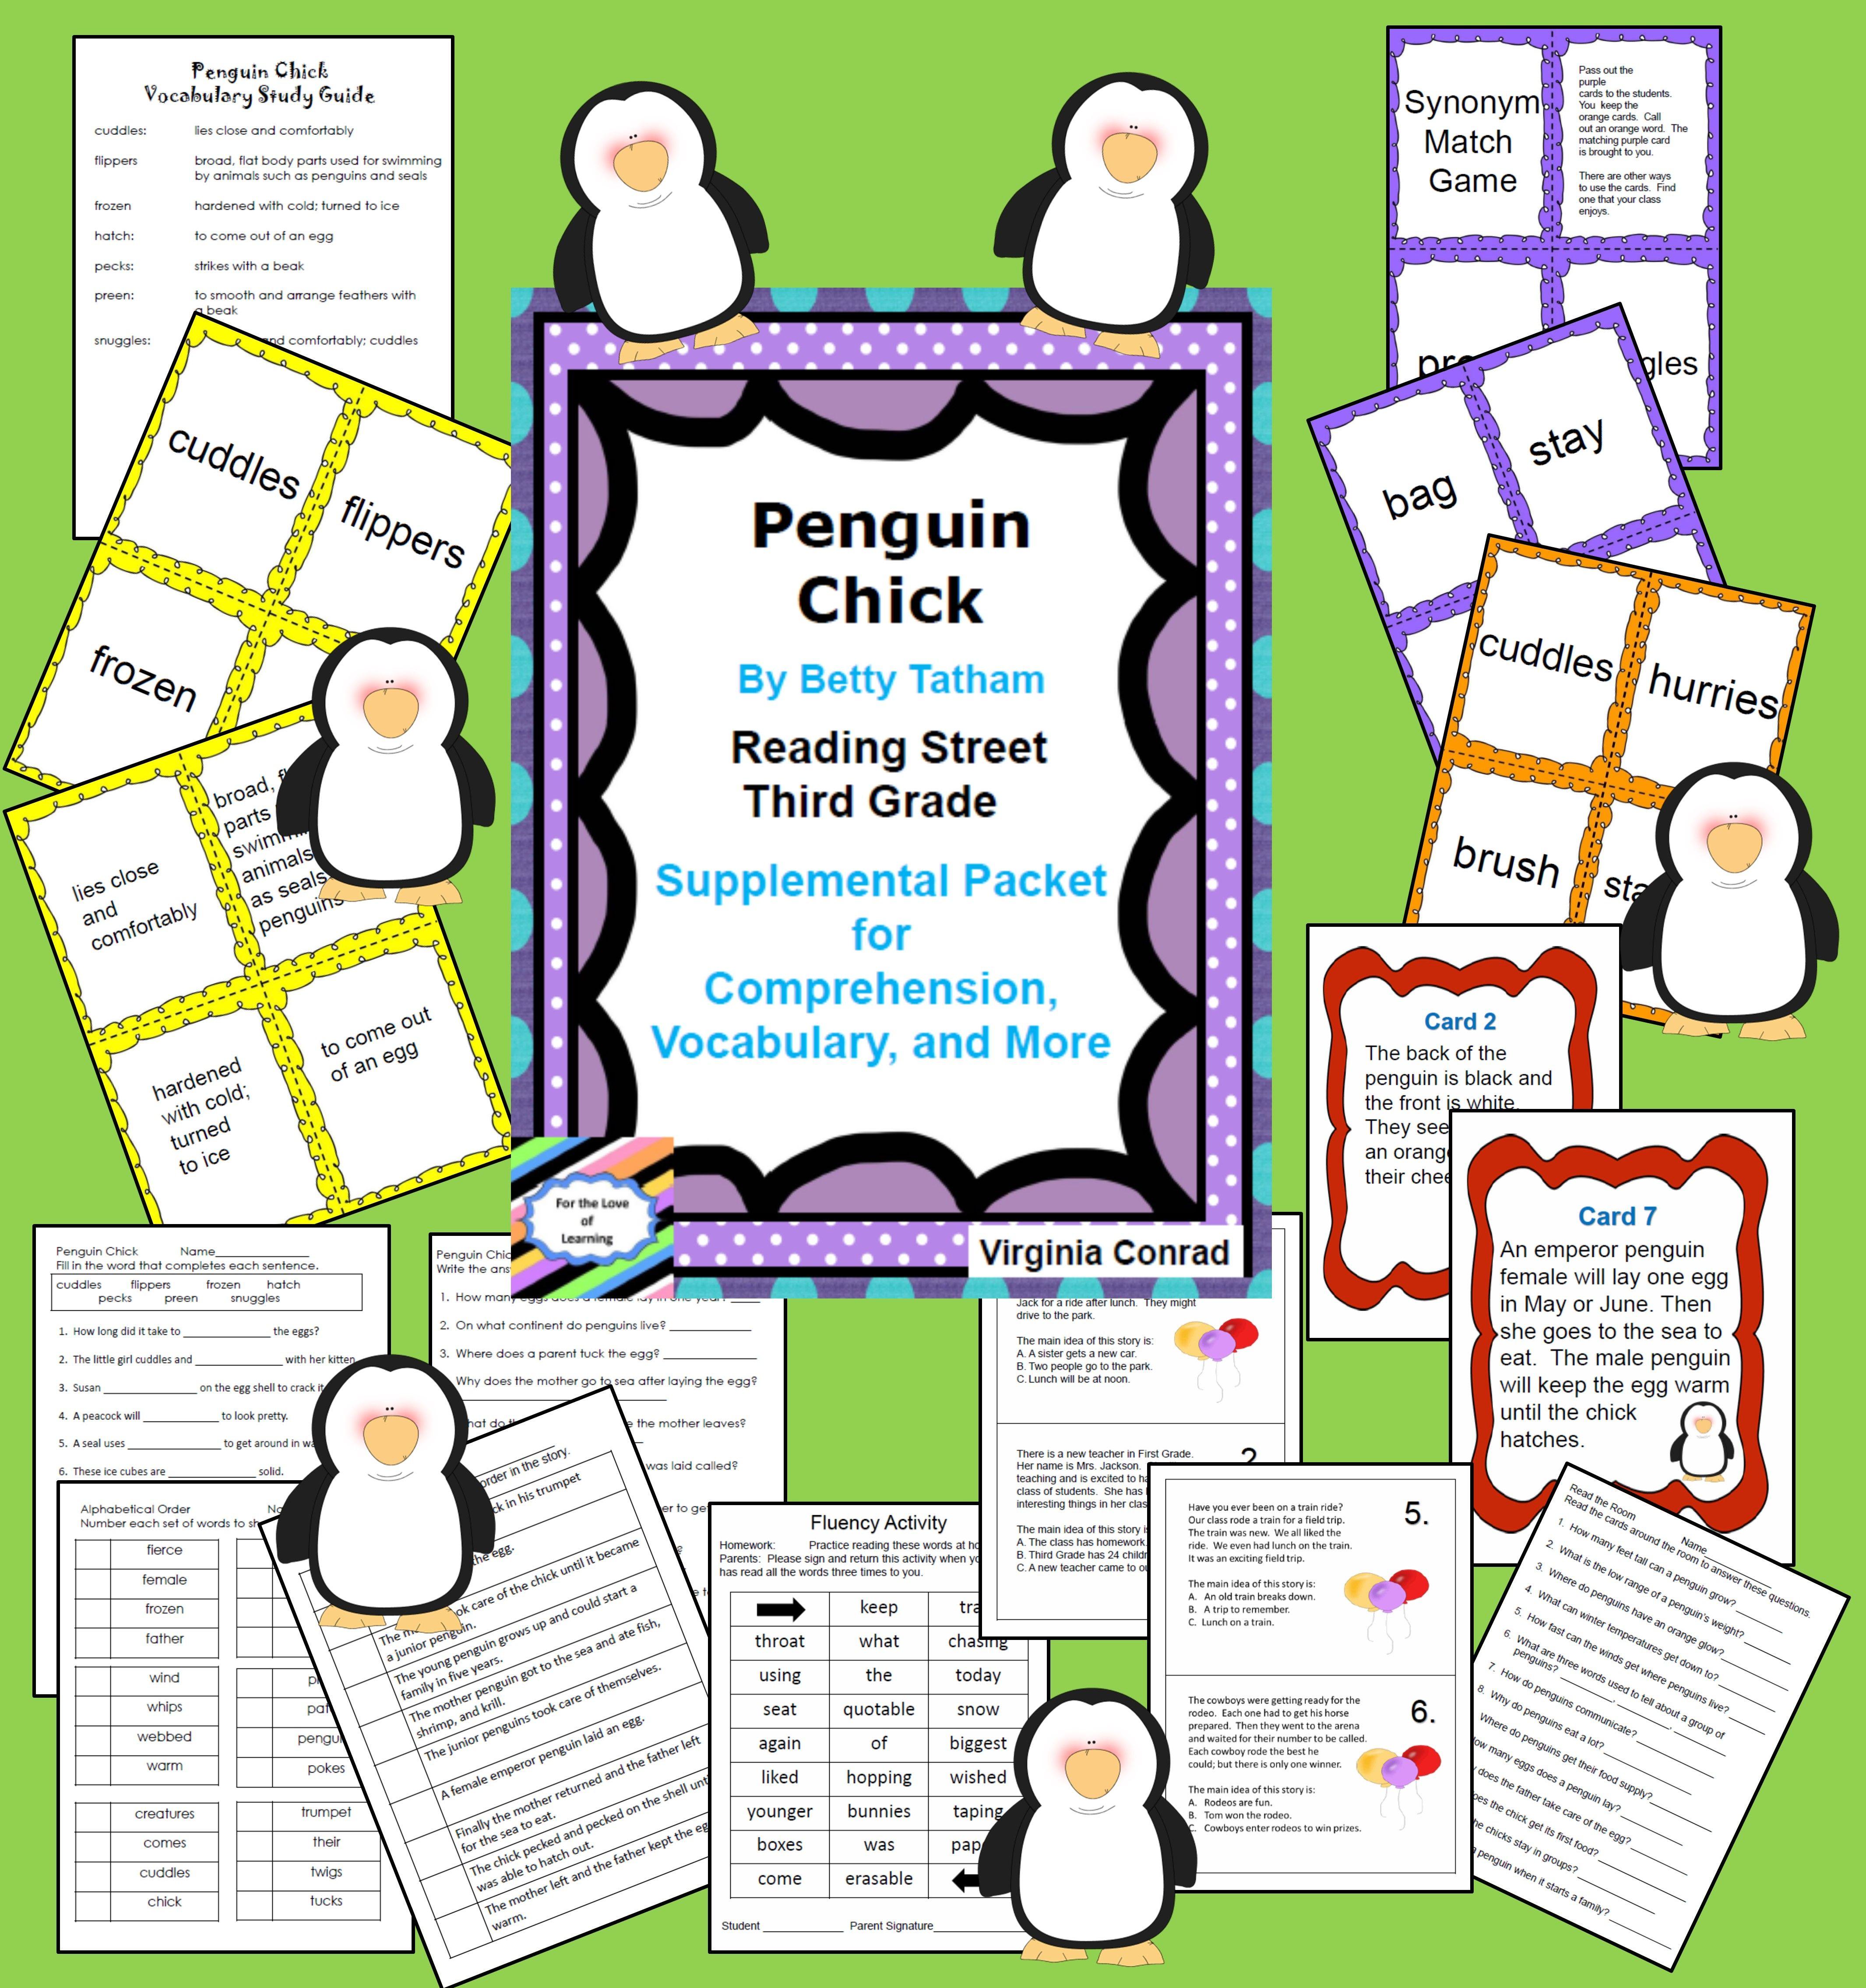 Penguin Chick Reading Street Supplemental Packet